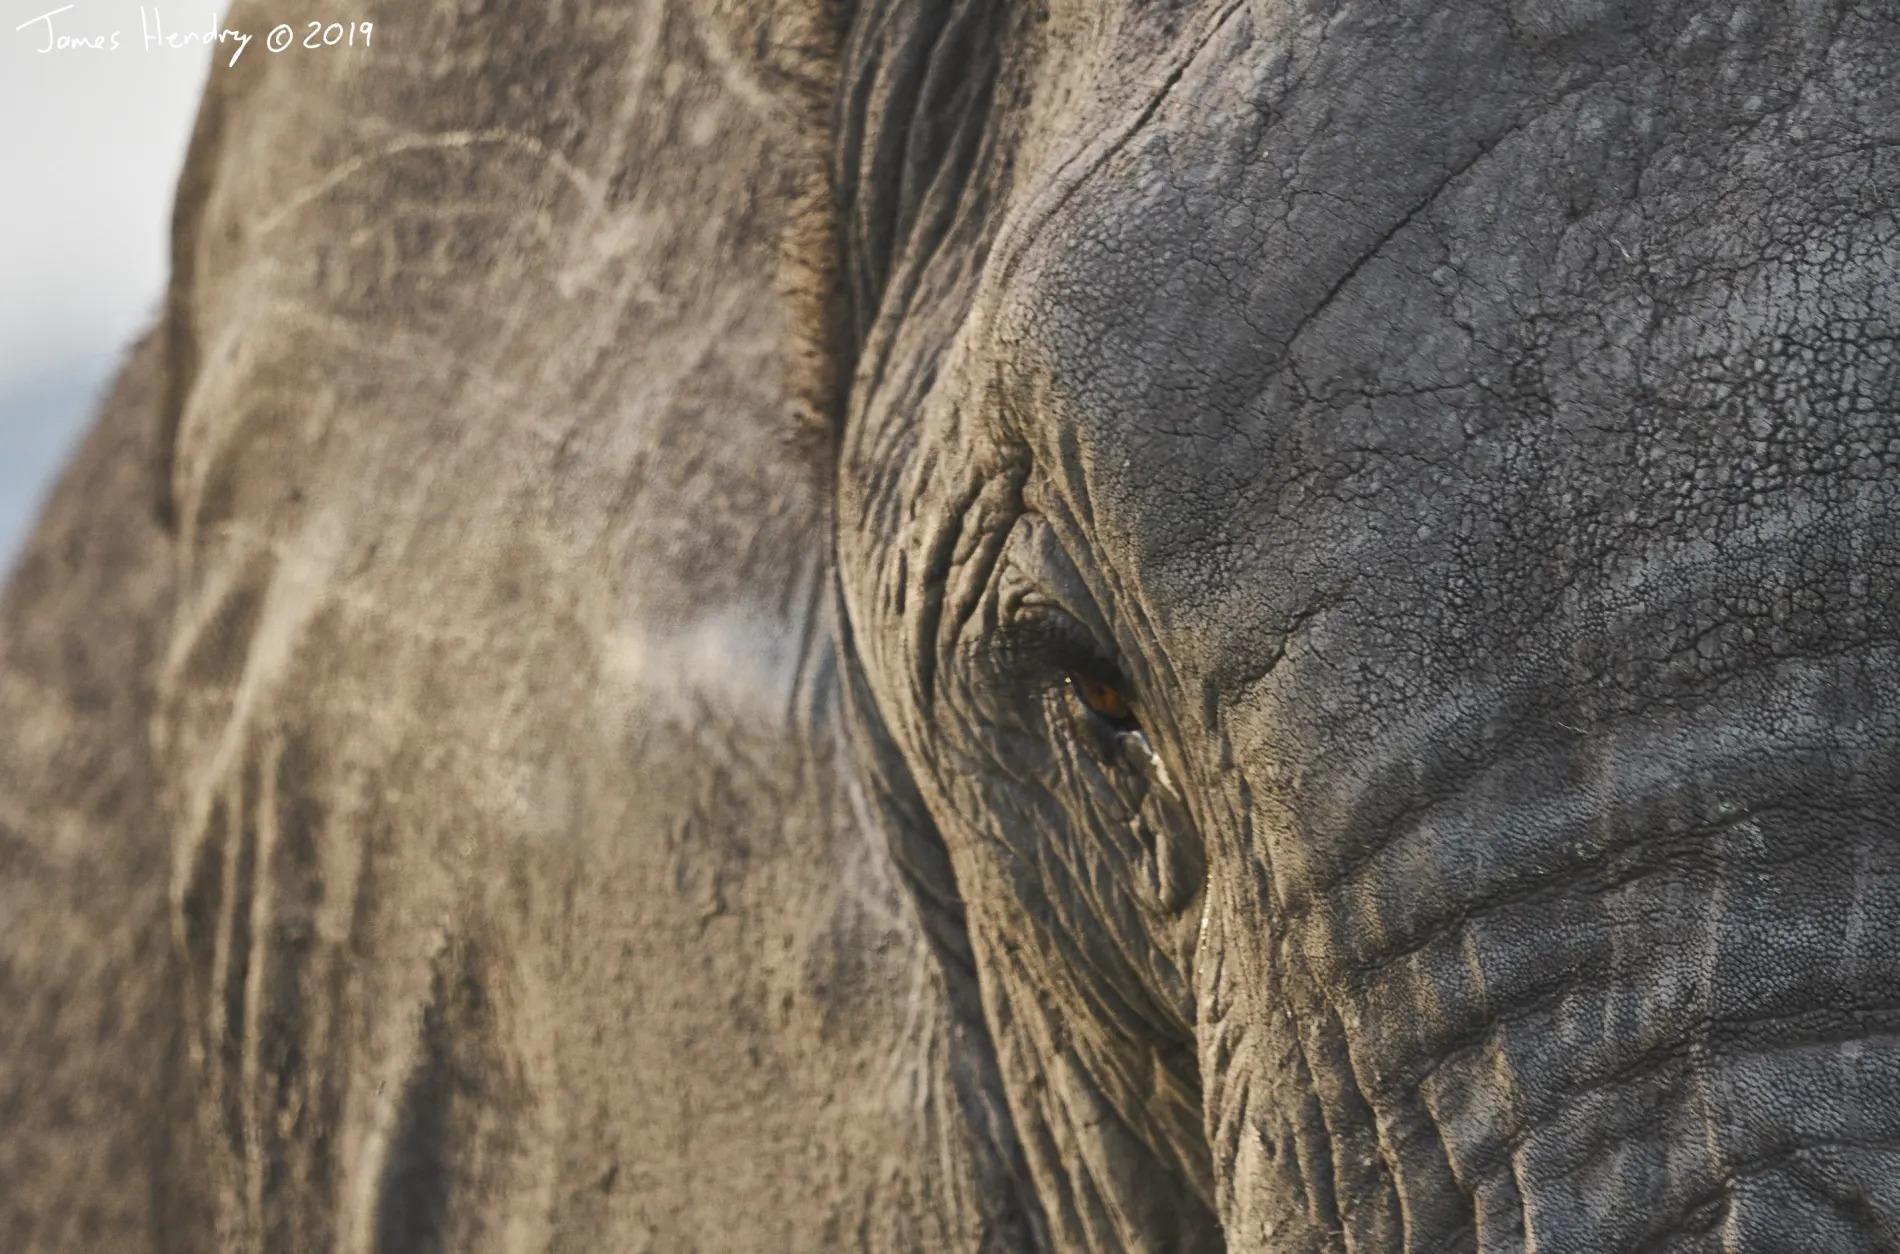 James Hendry_Elephant